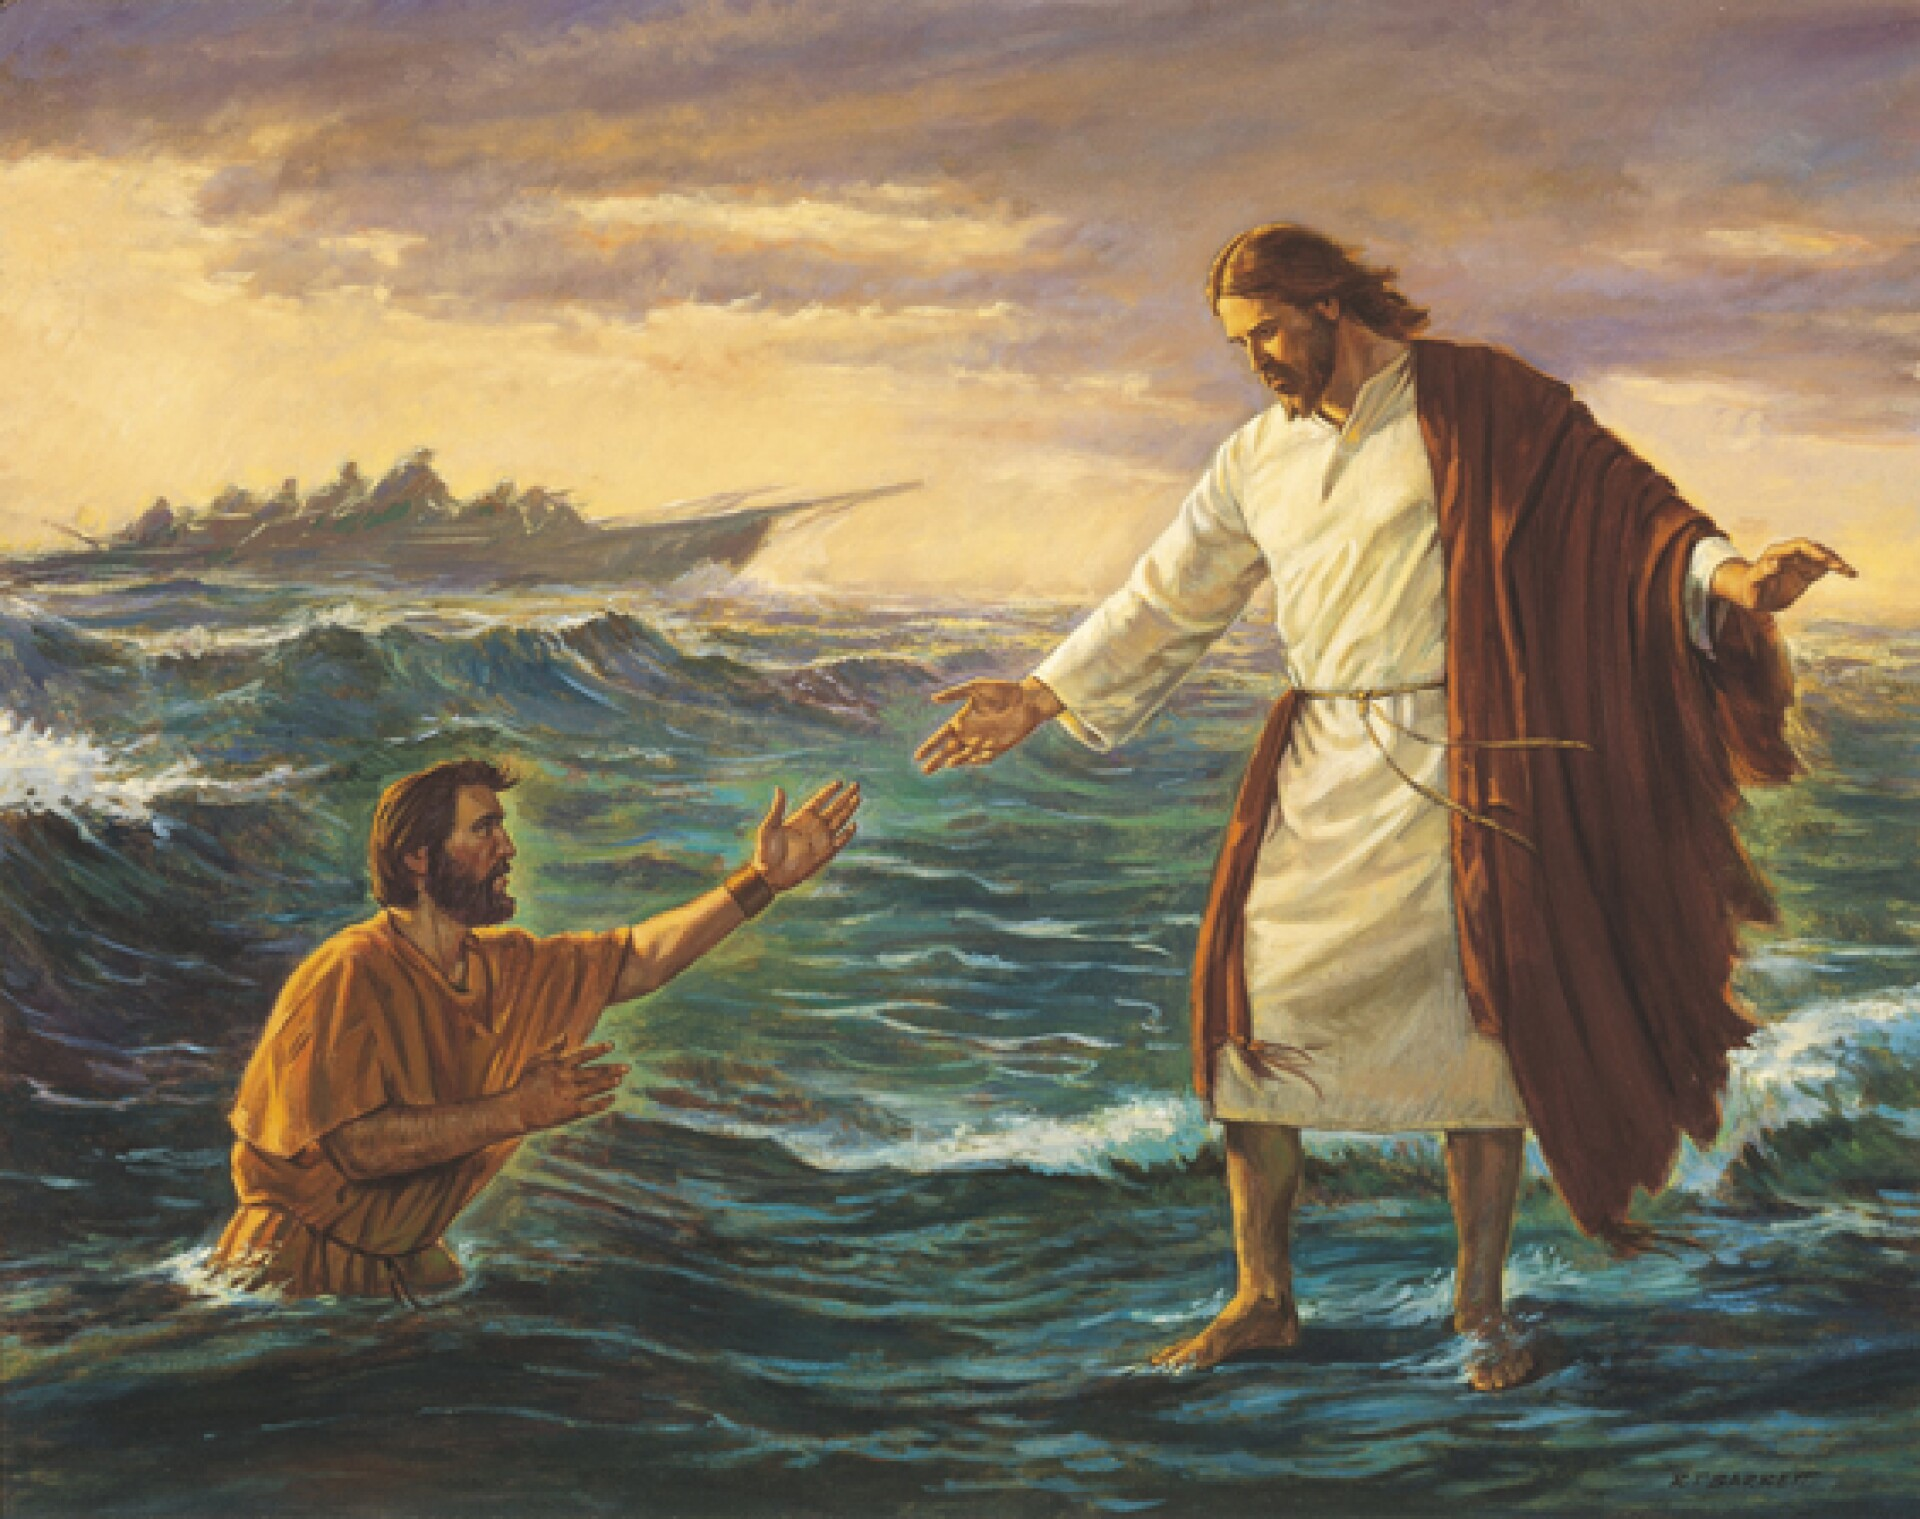 Jesus is walking on the water